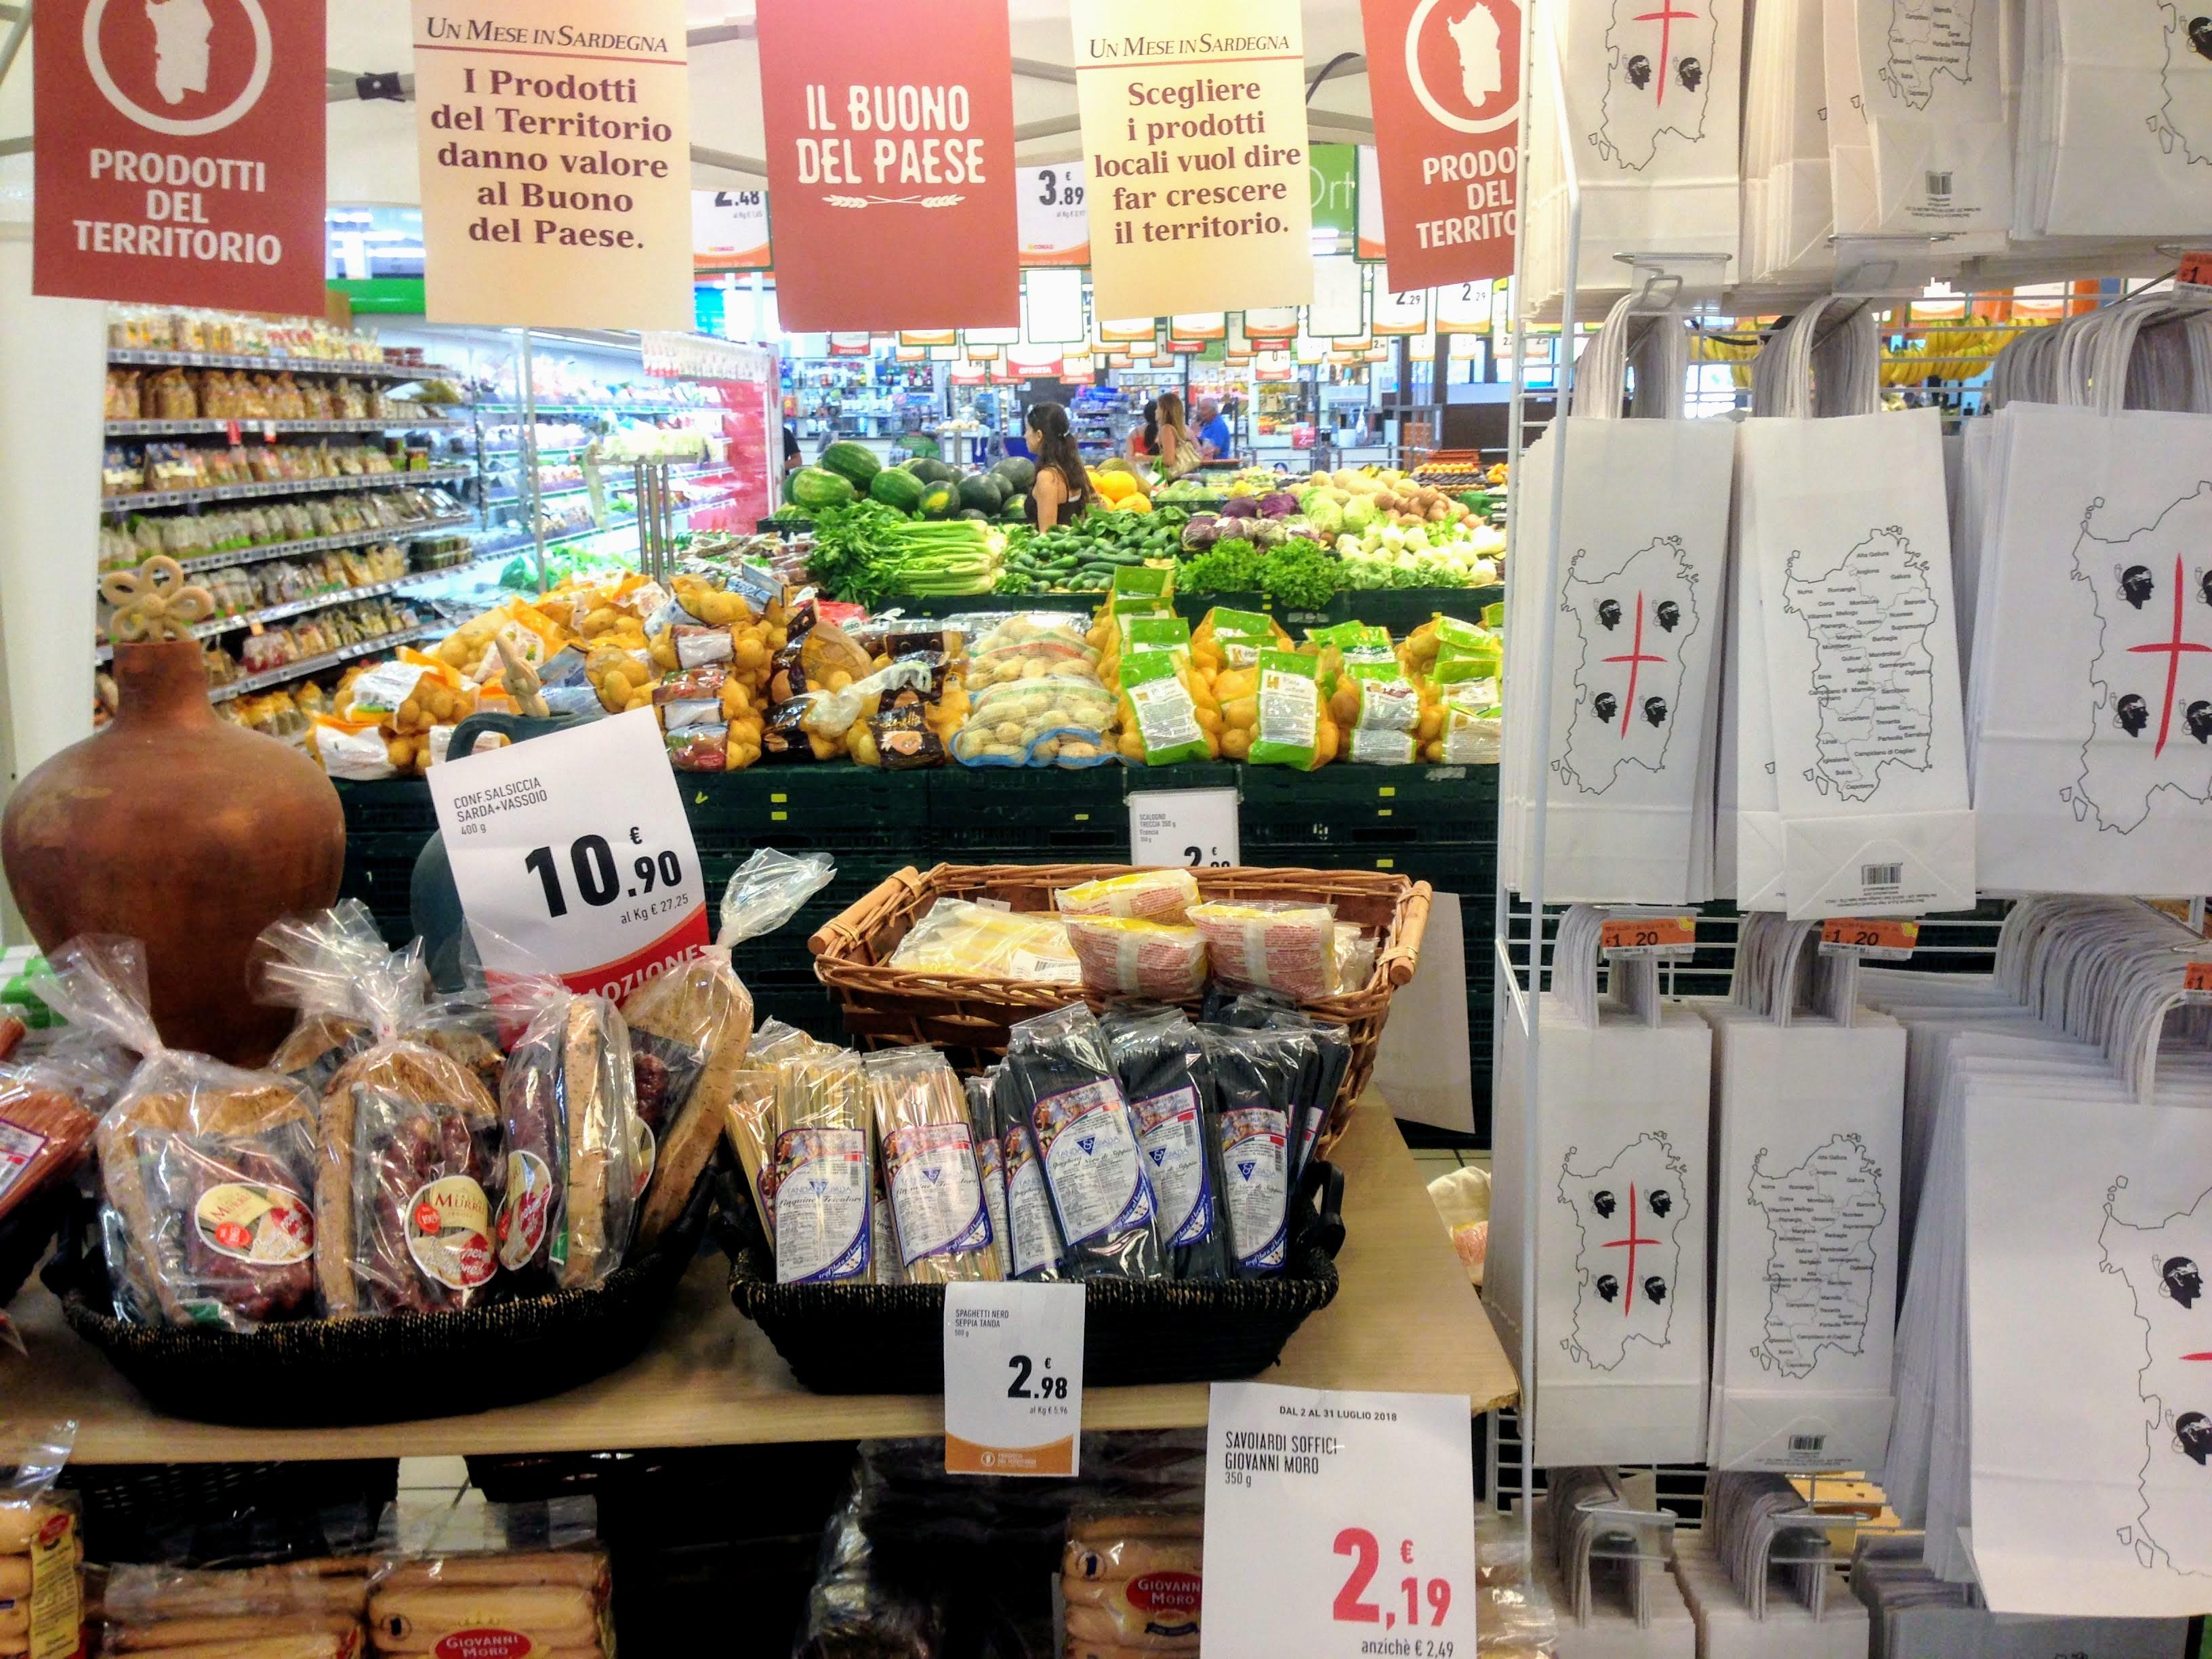 Sardinia Italy supermarket local food solo trip guide